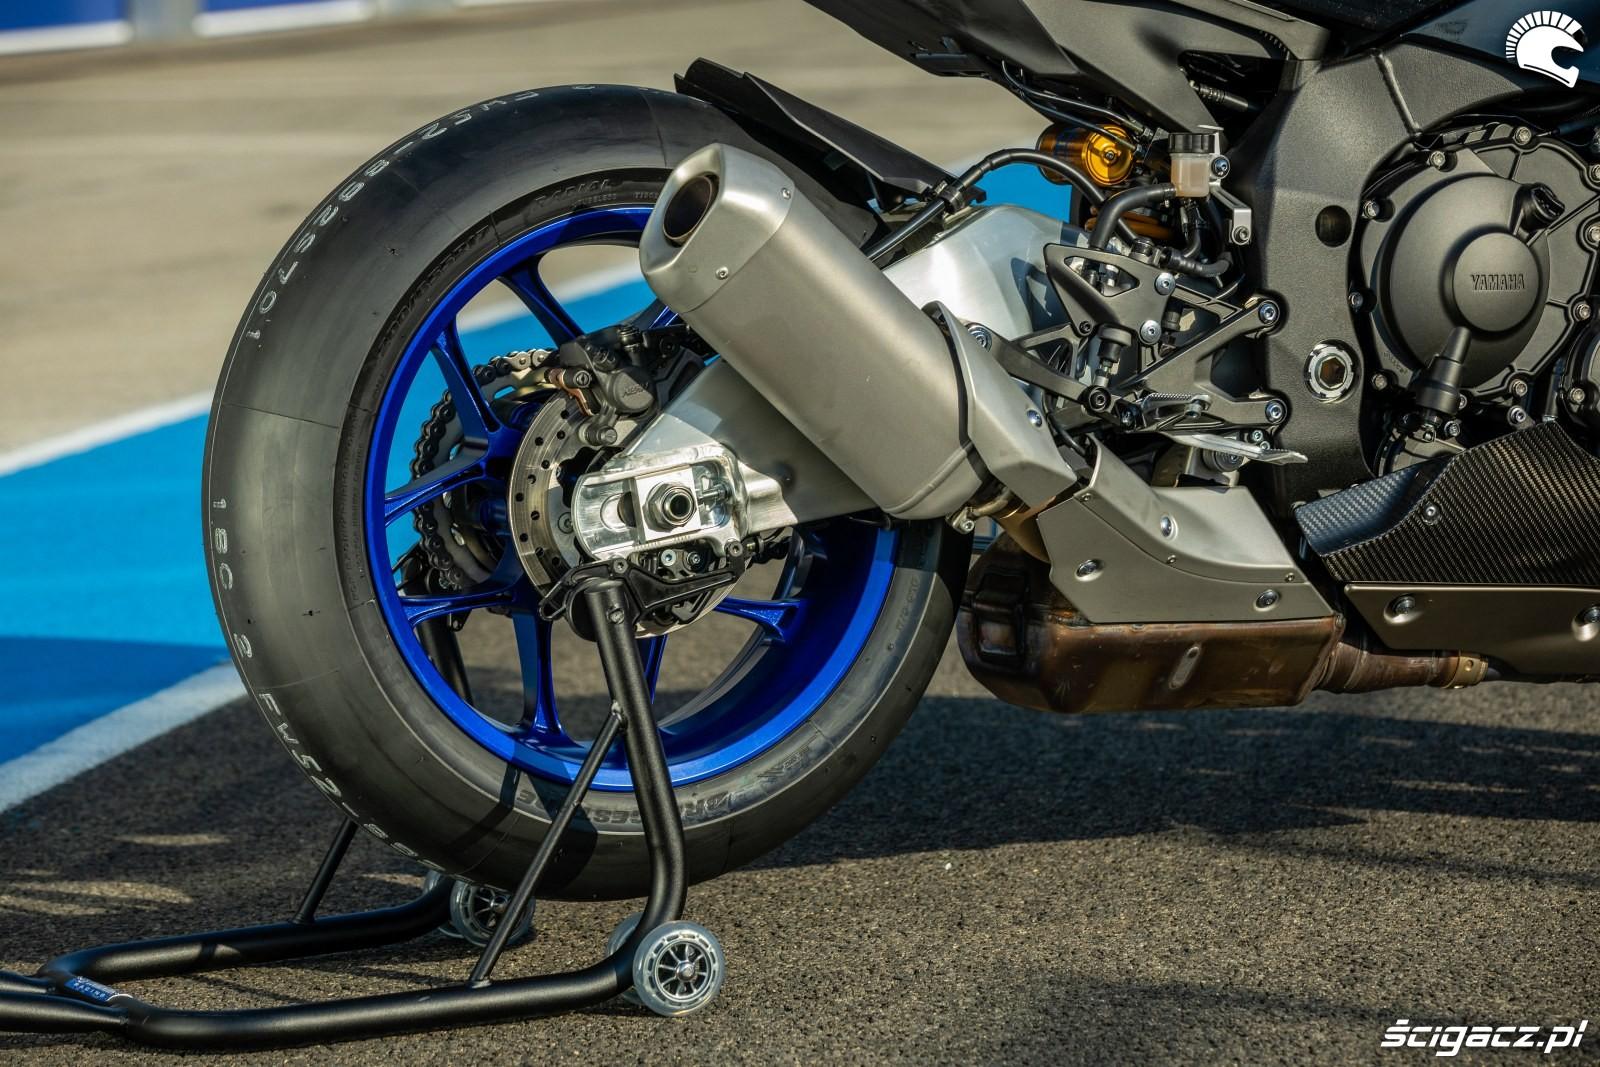 Yamaha R1 M 2020 wydech